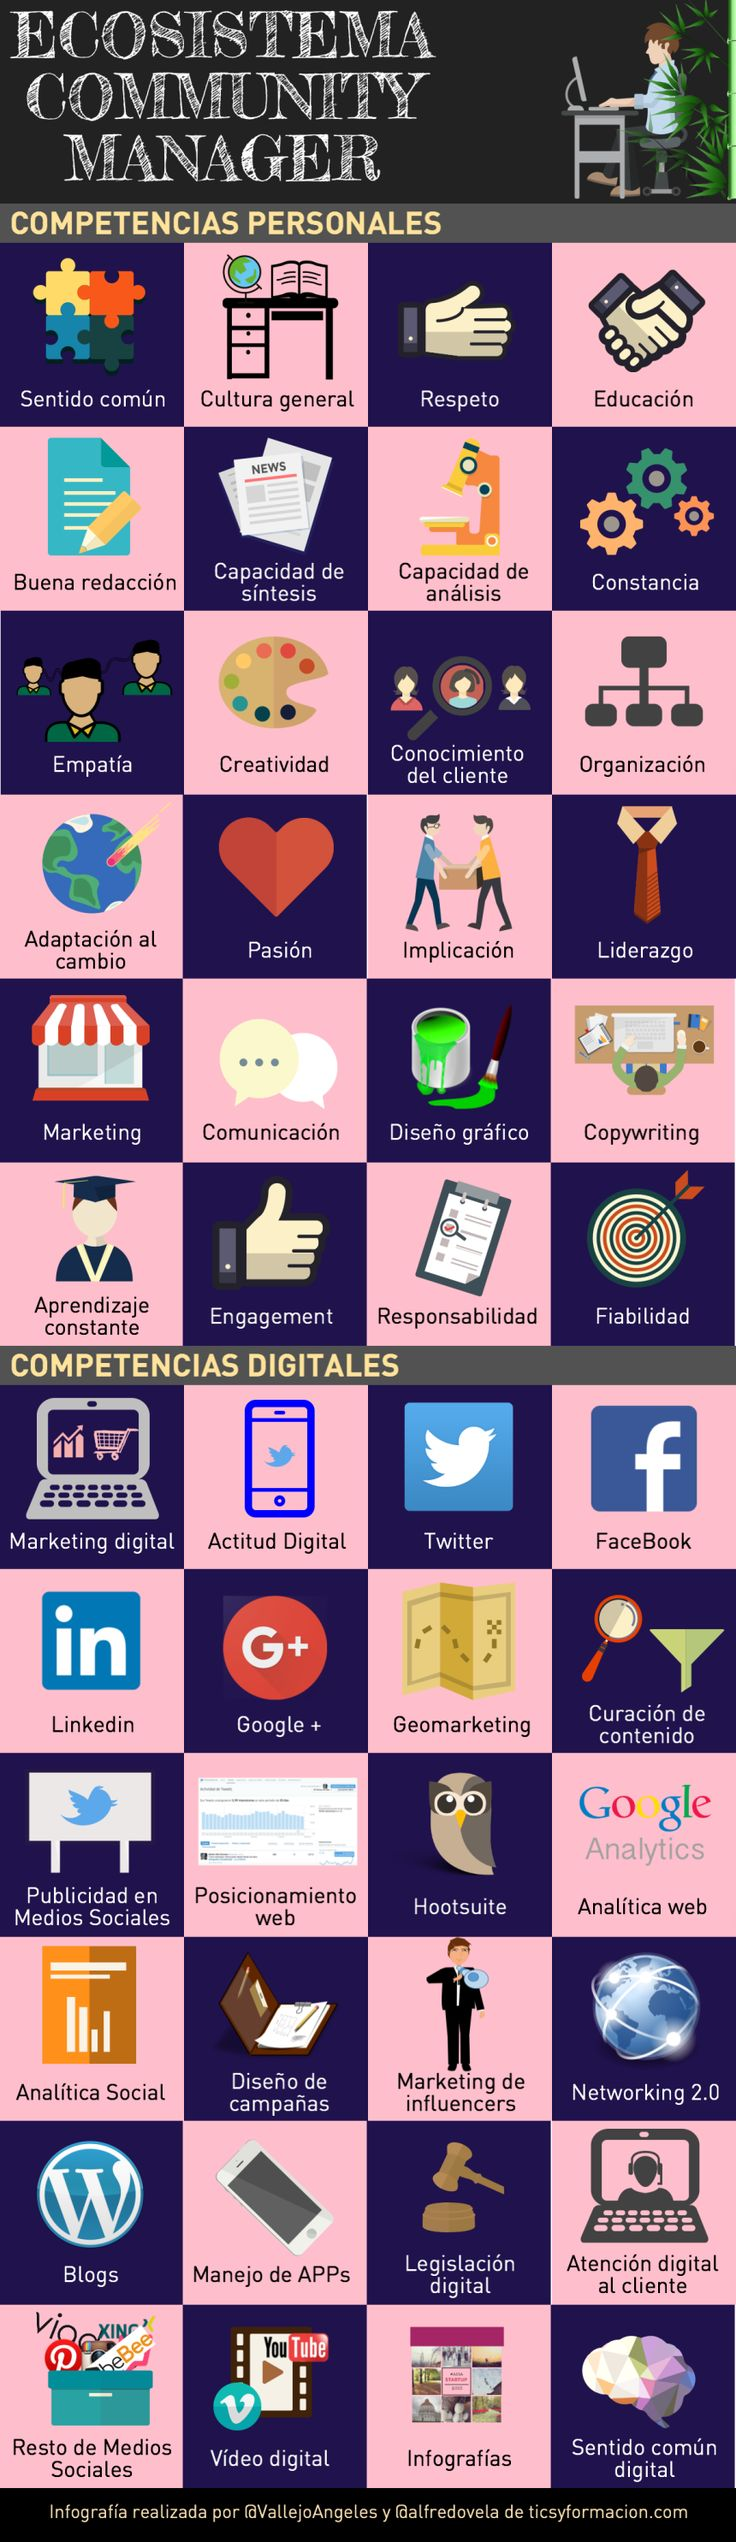 Ecosistema del Community Manager, social media